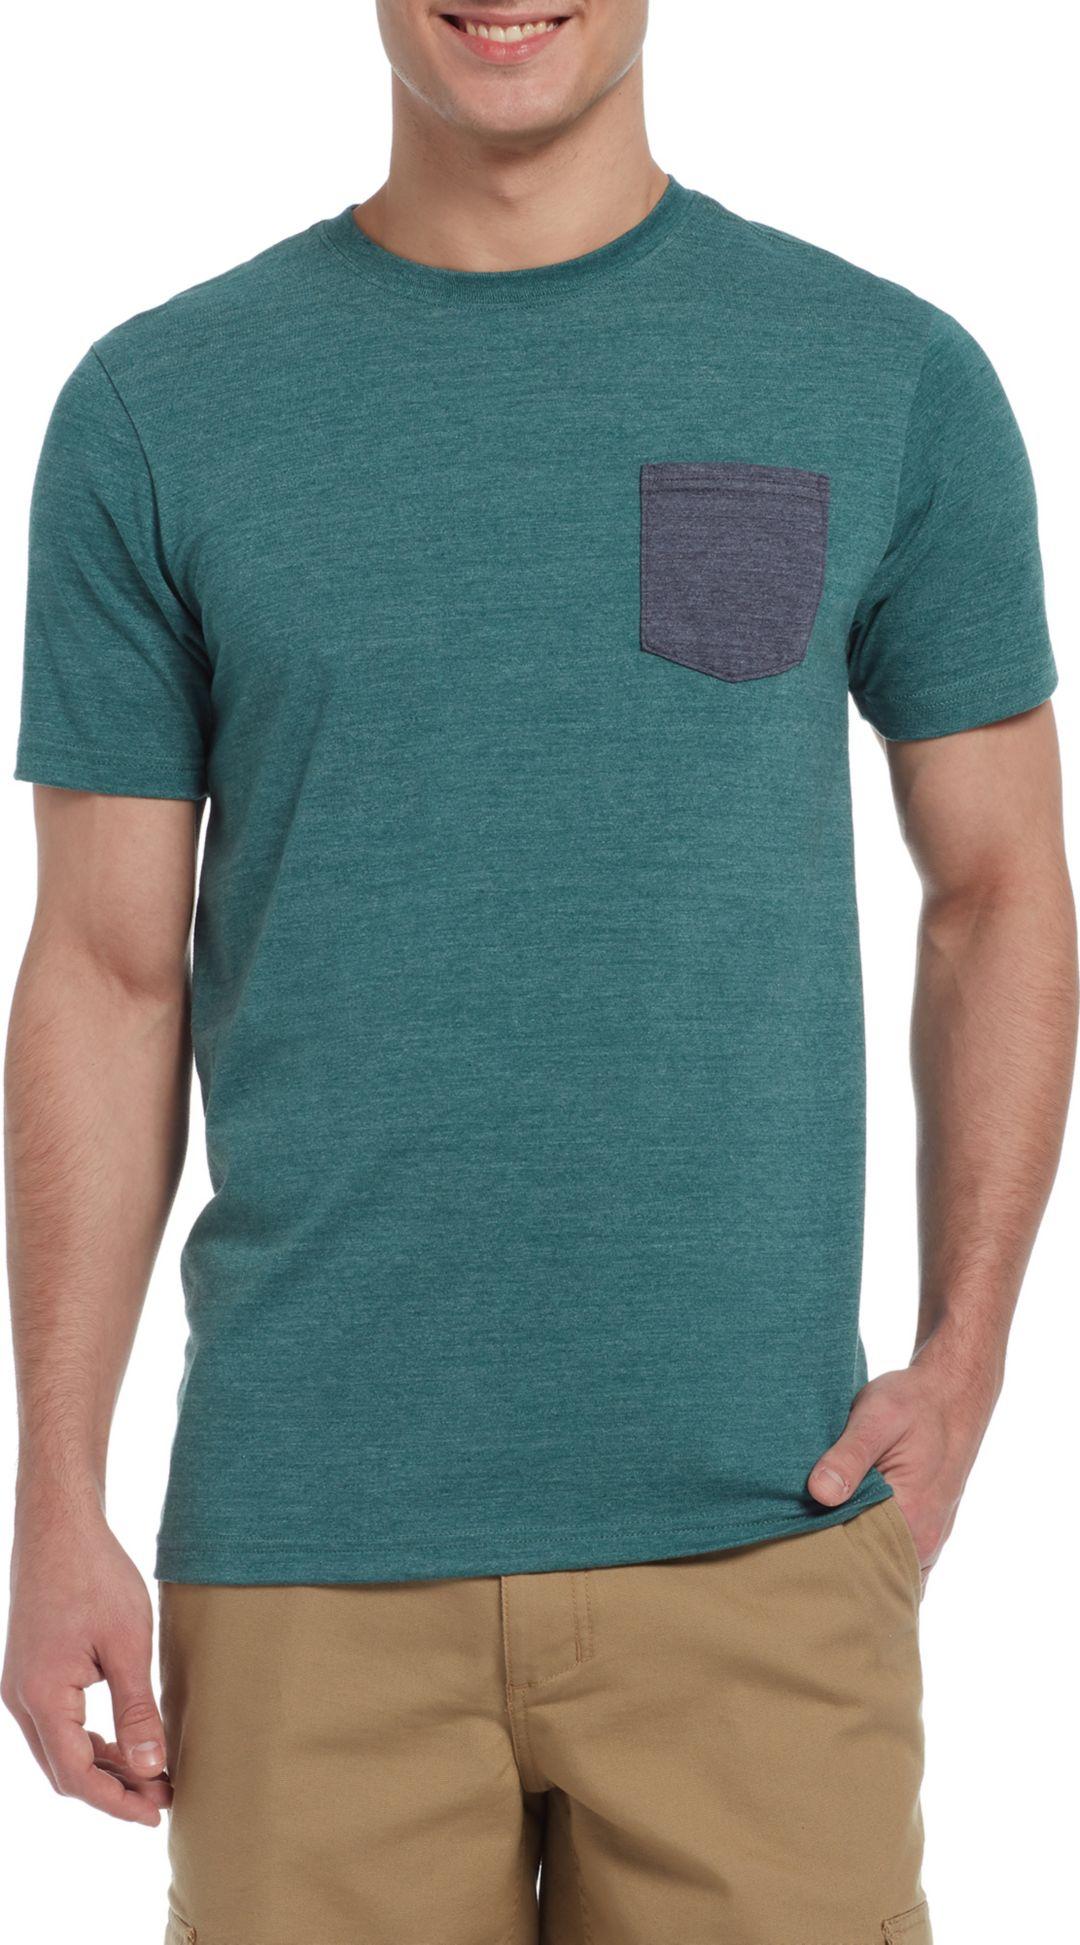 31e948c9 The North Face Men's Tri-Blend Pocket T-Shirt | DICK'S Sporting Goods